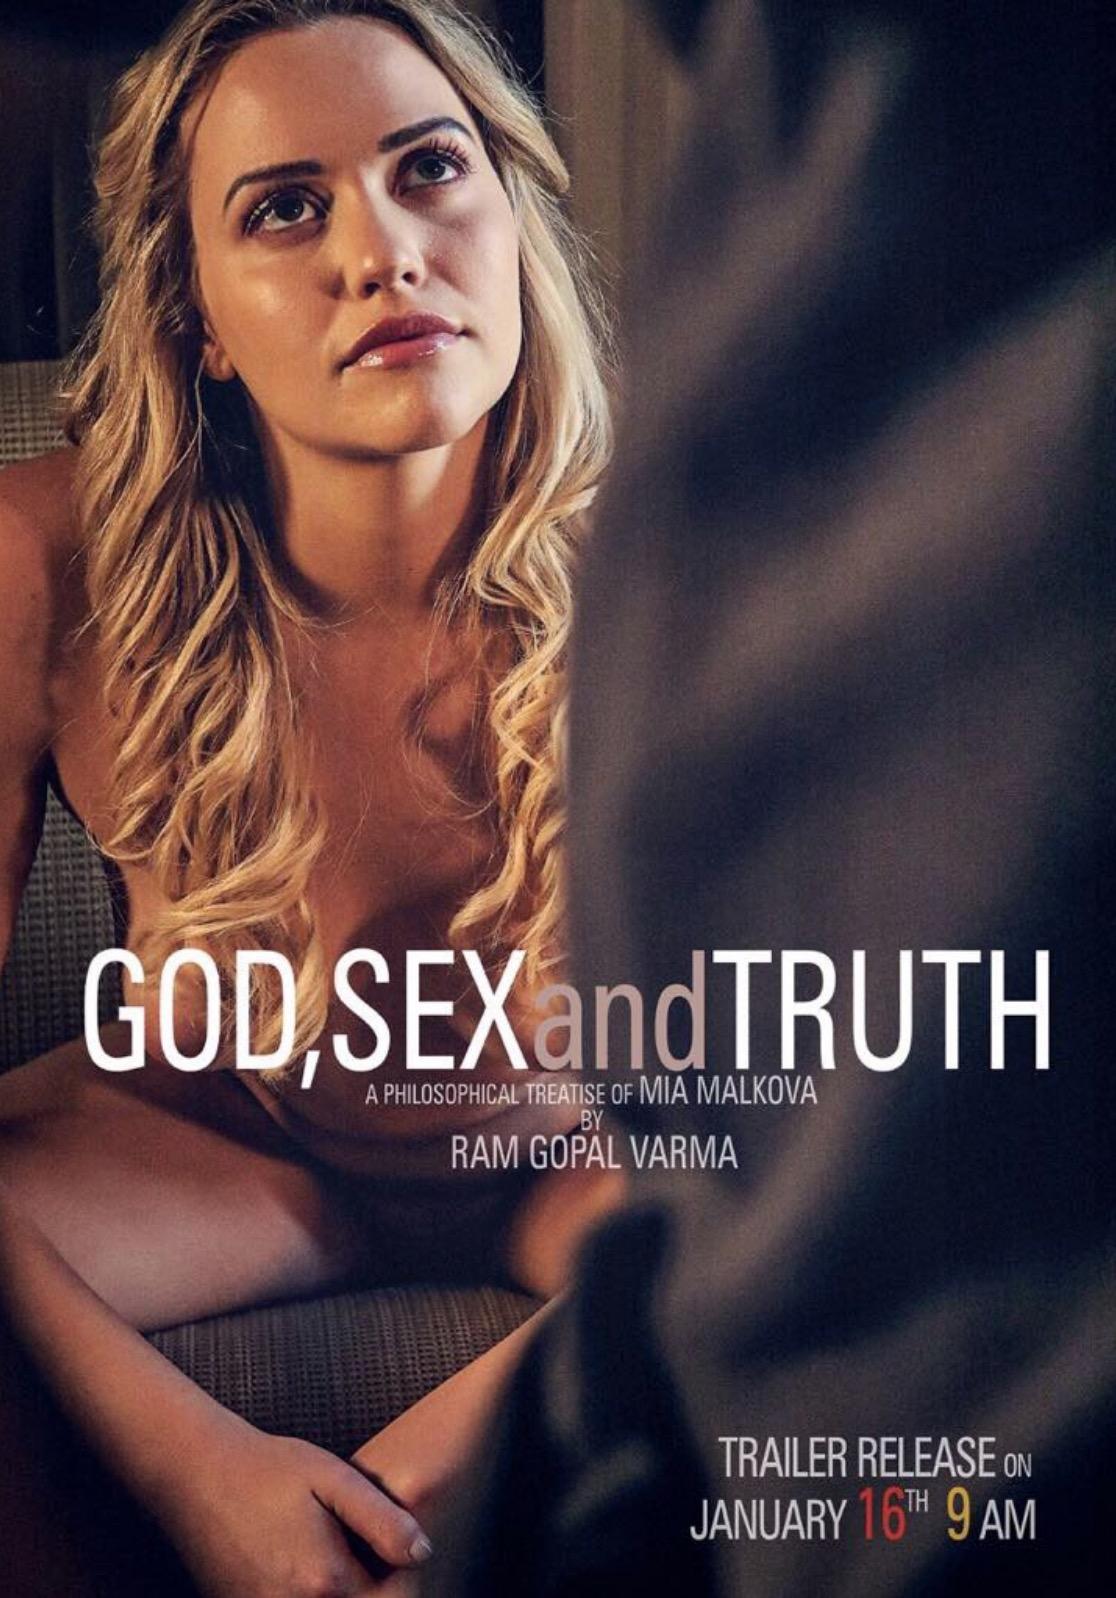 God, Sex and Truth kapak